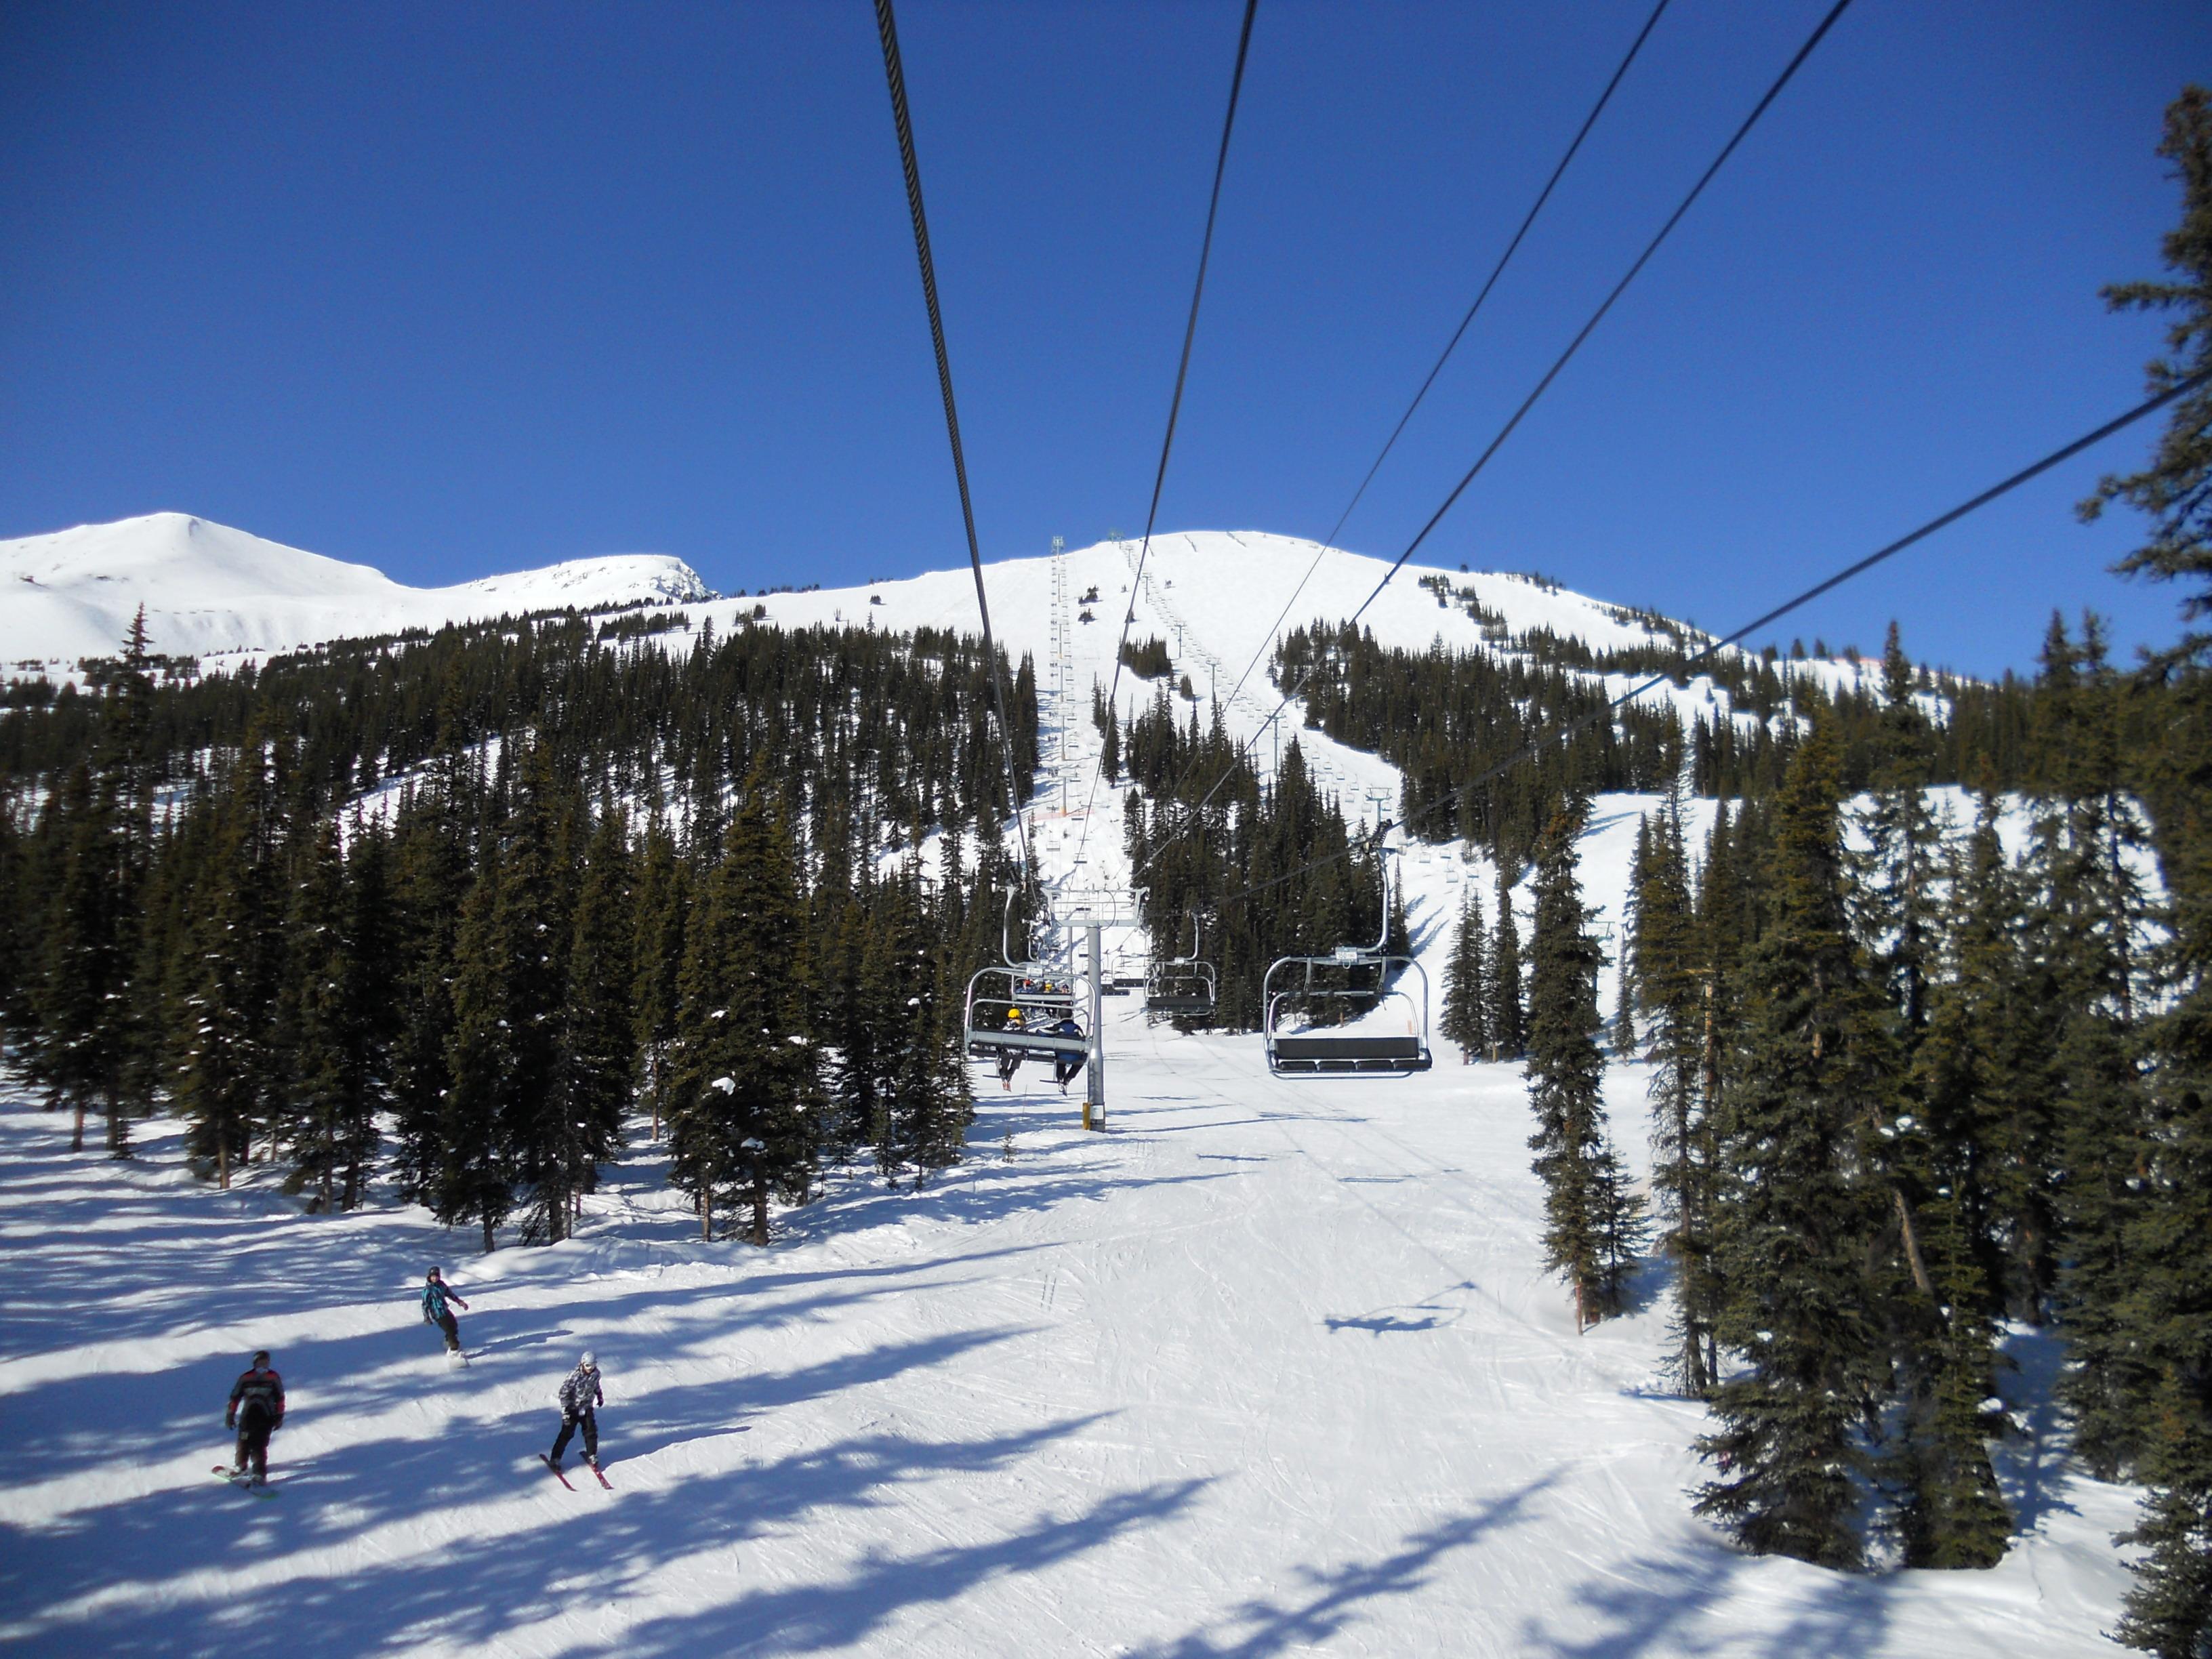 Canadian Express Chair, Marmot Basin